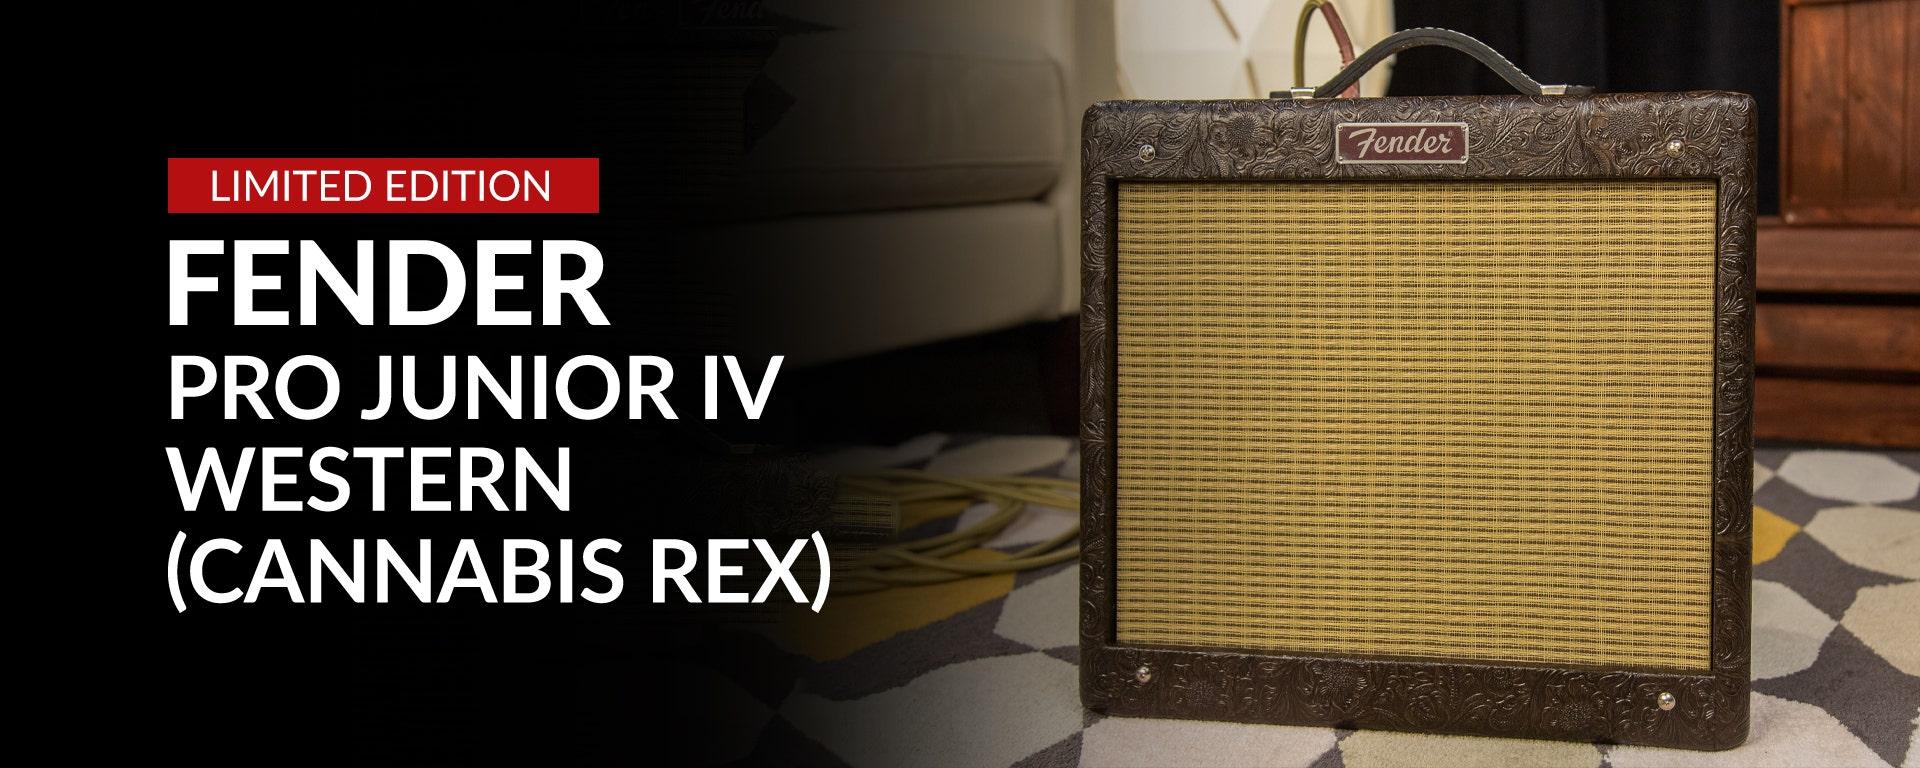 Limited Edition: Fender Pro Junior IV Western (Cannabis Rex)